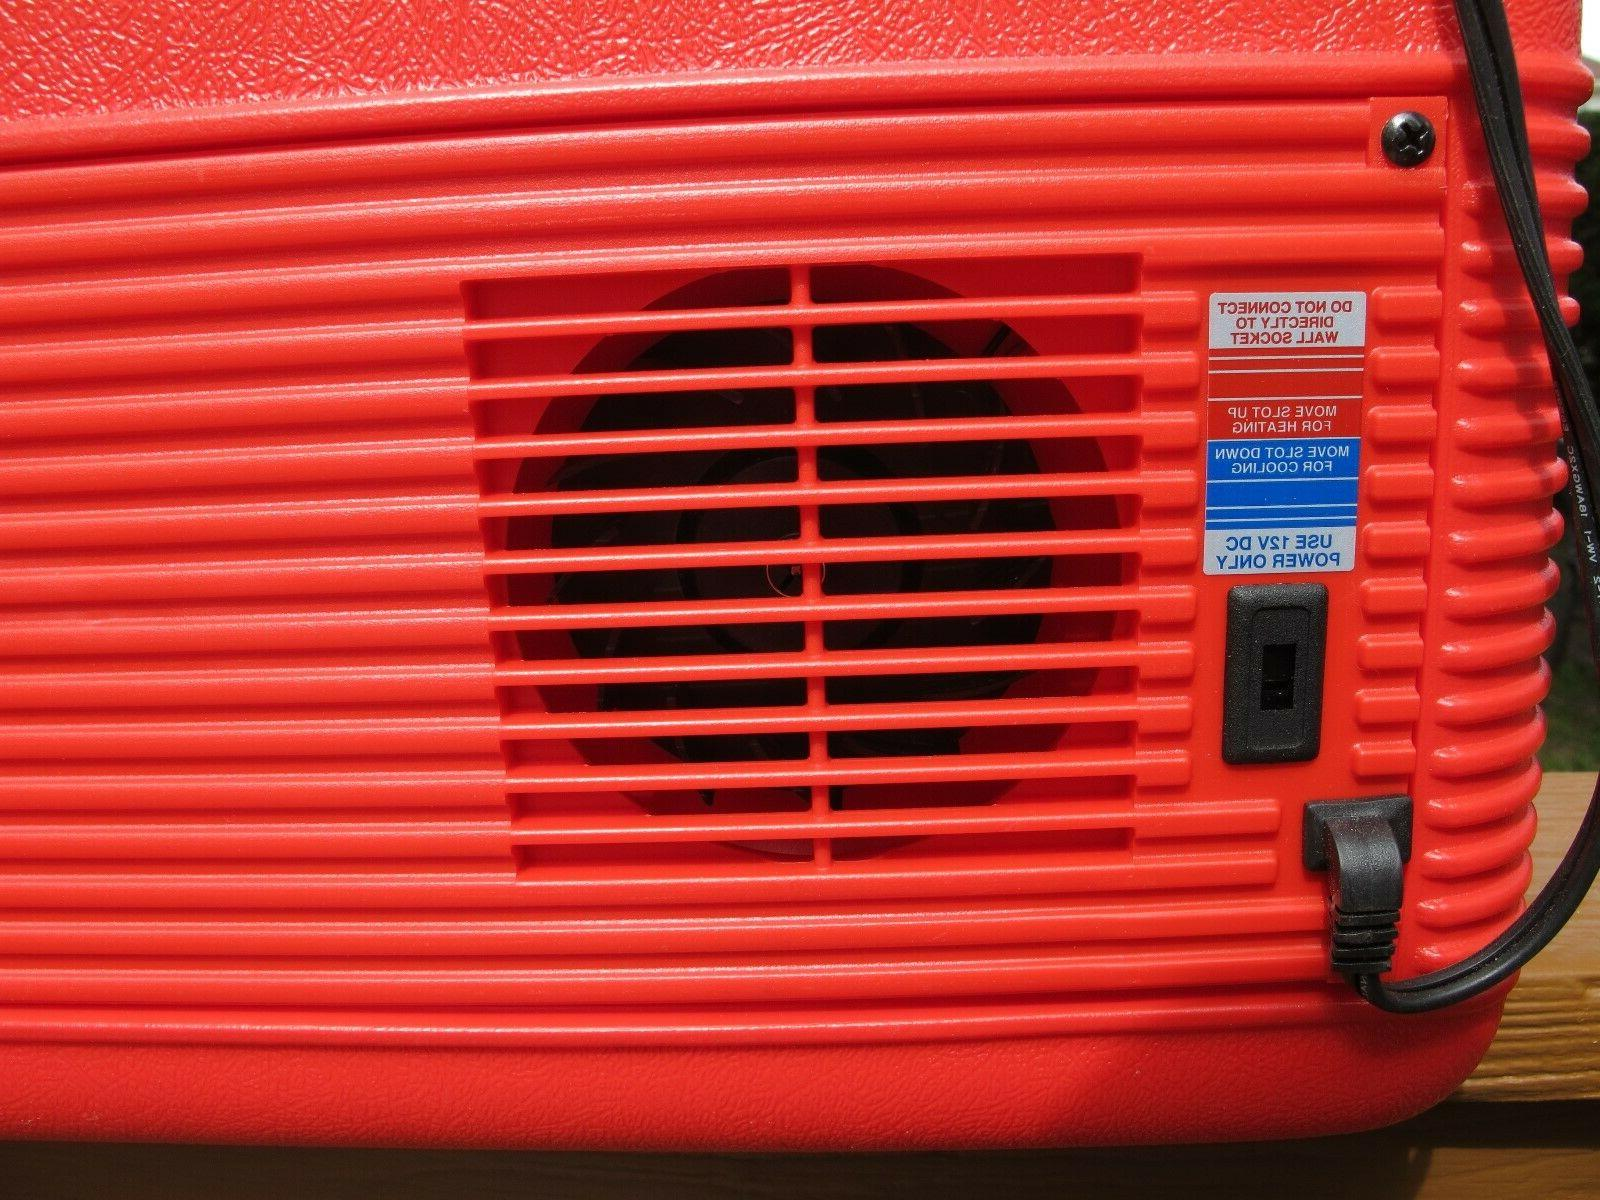 New w/Box Portable Cooler Warmer 5232